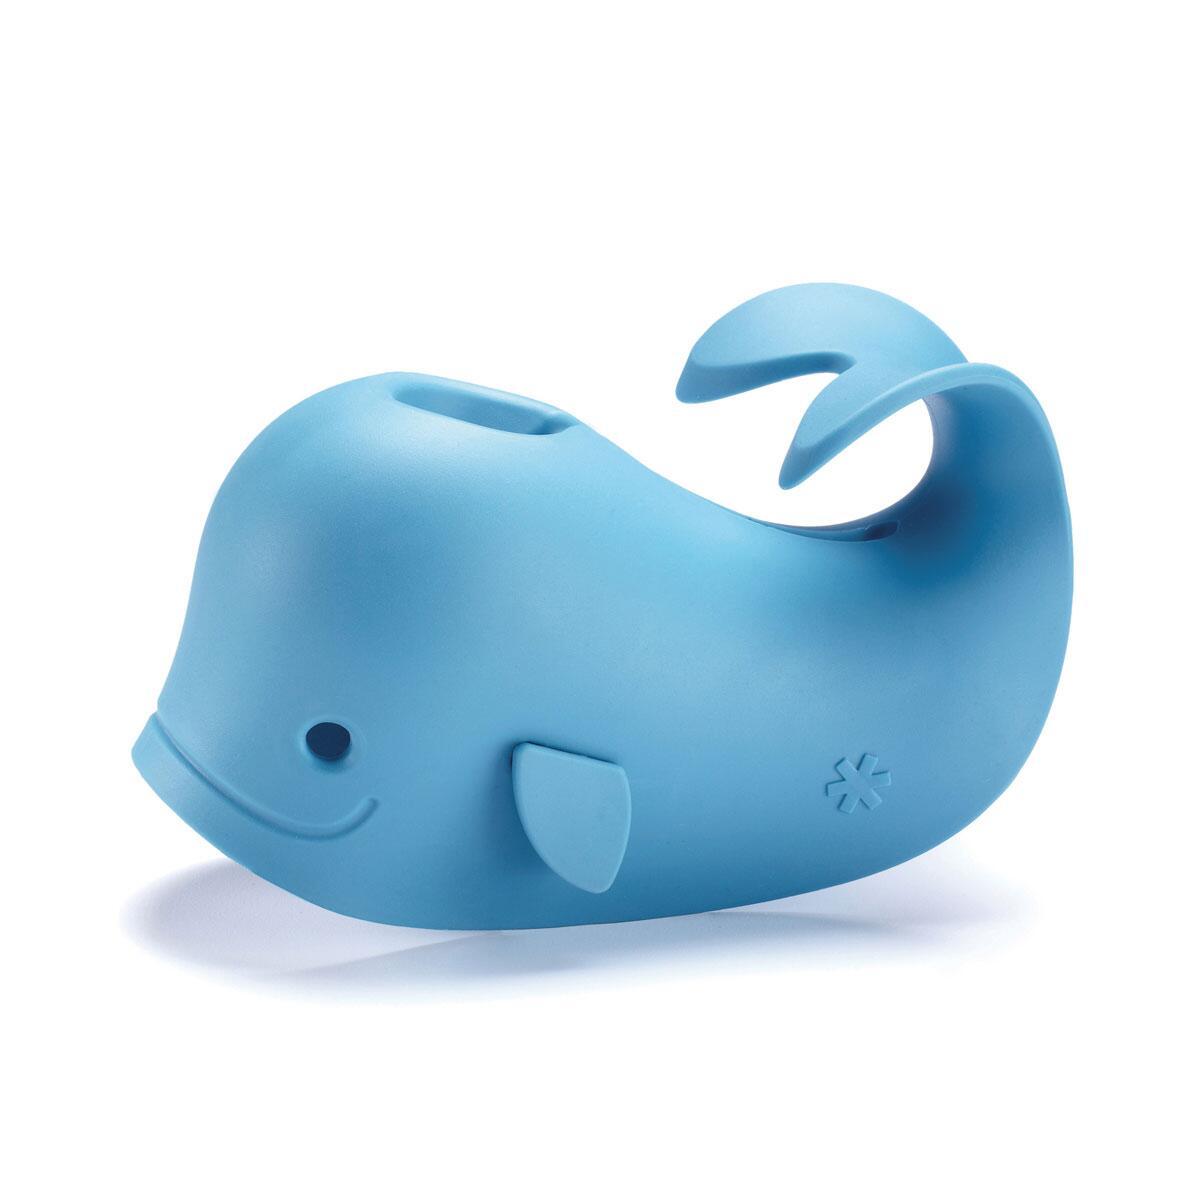 Protège-robinet Baleine